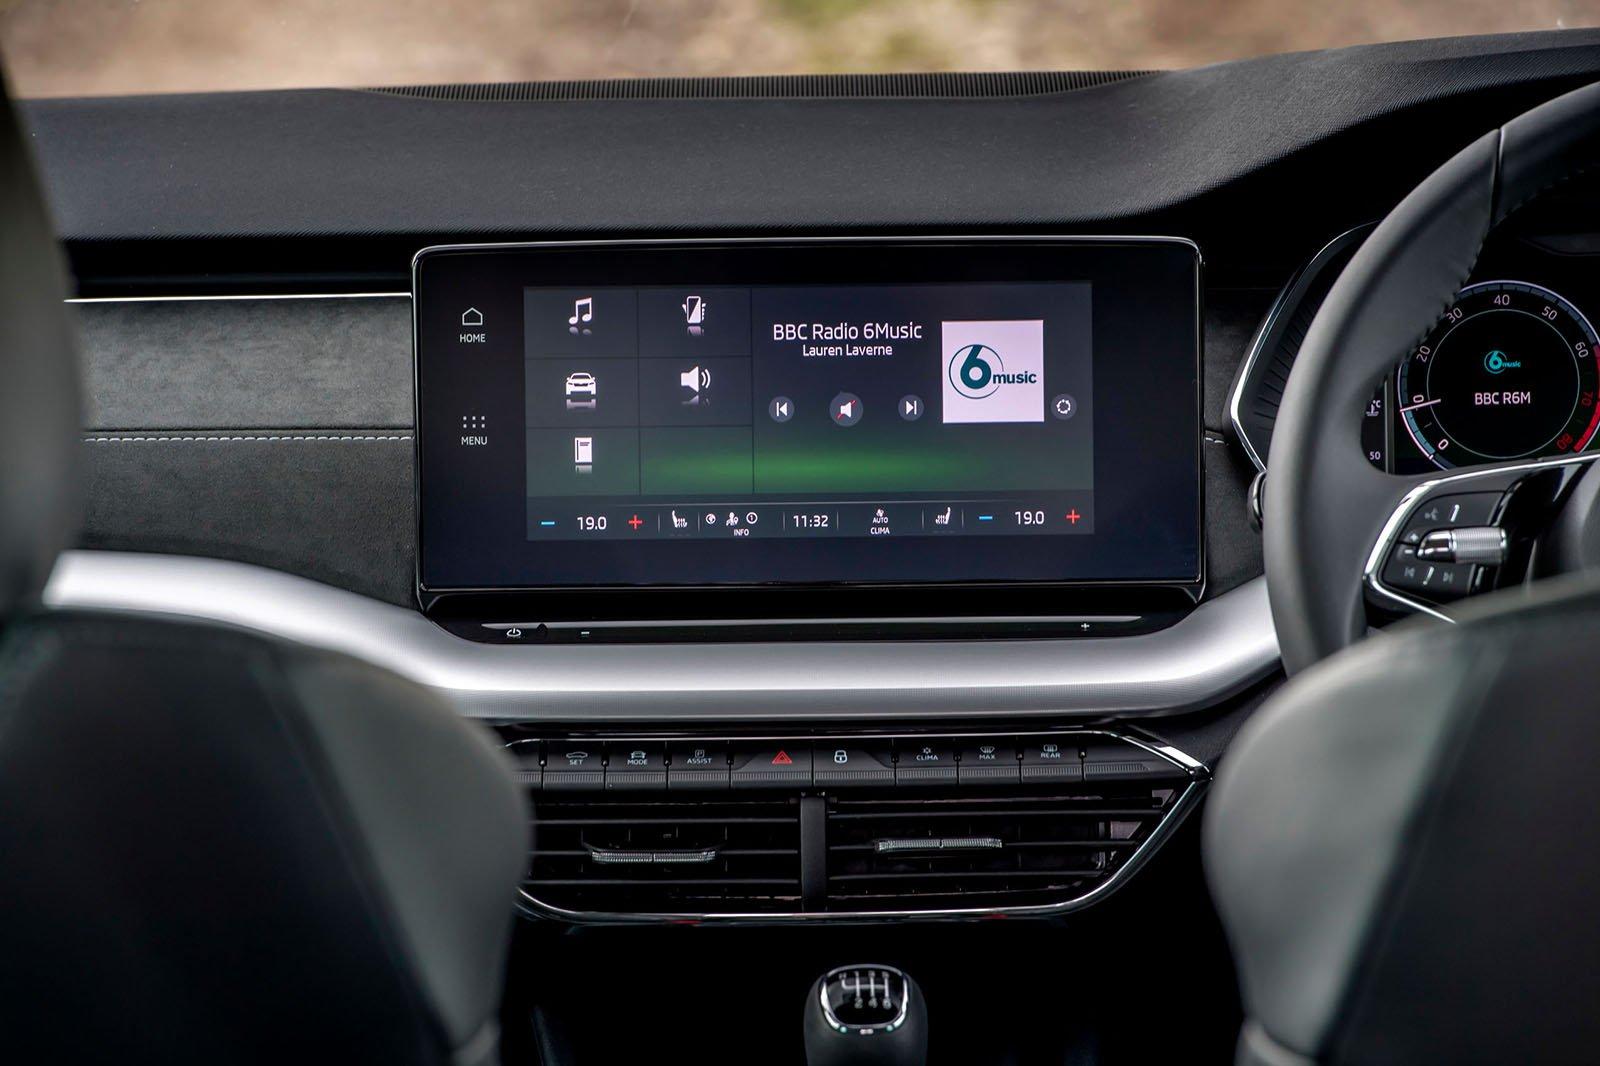 Skoda Octavia hatchback 2020 infotainment